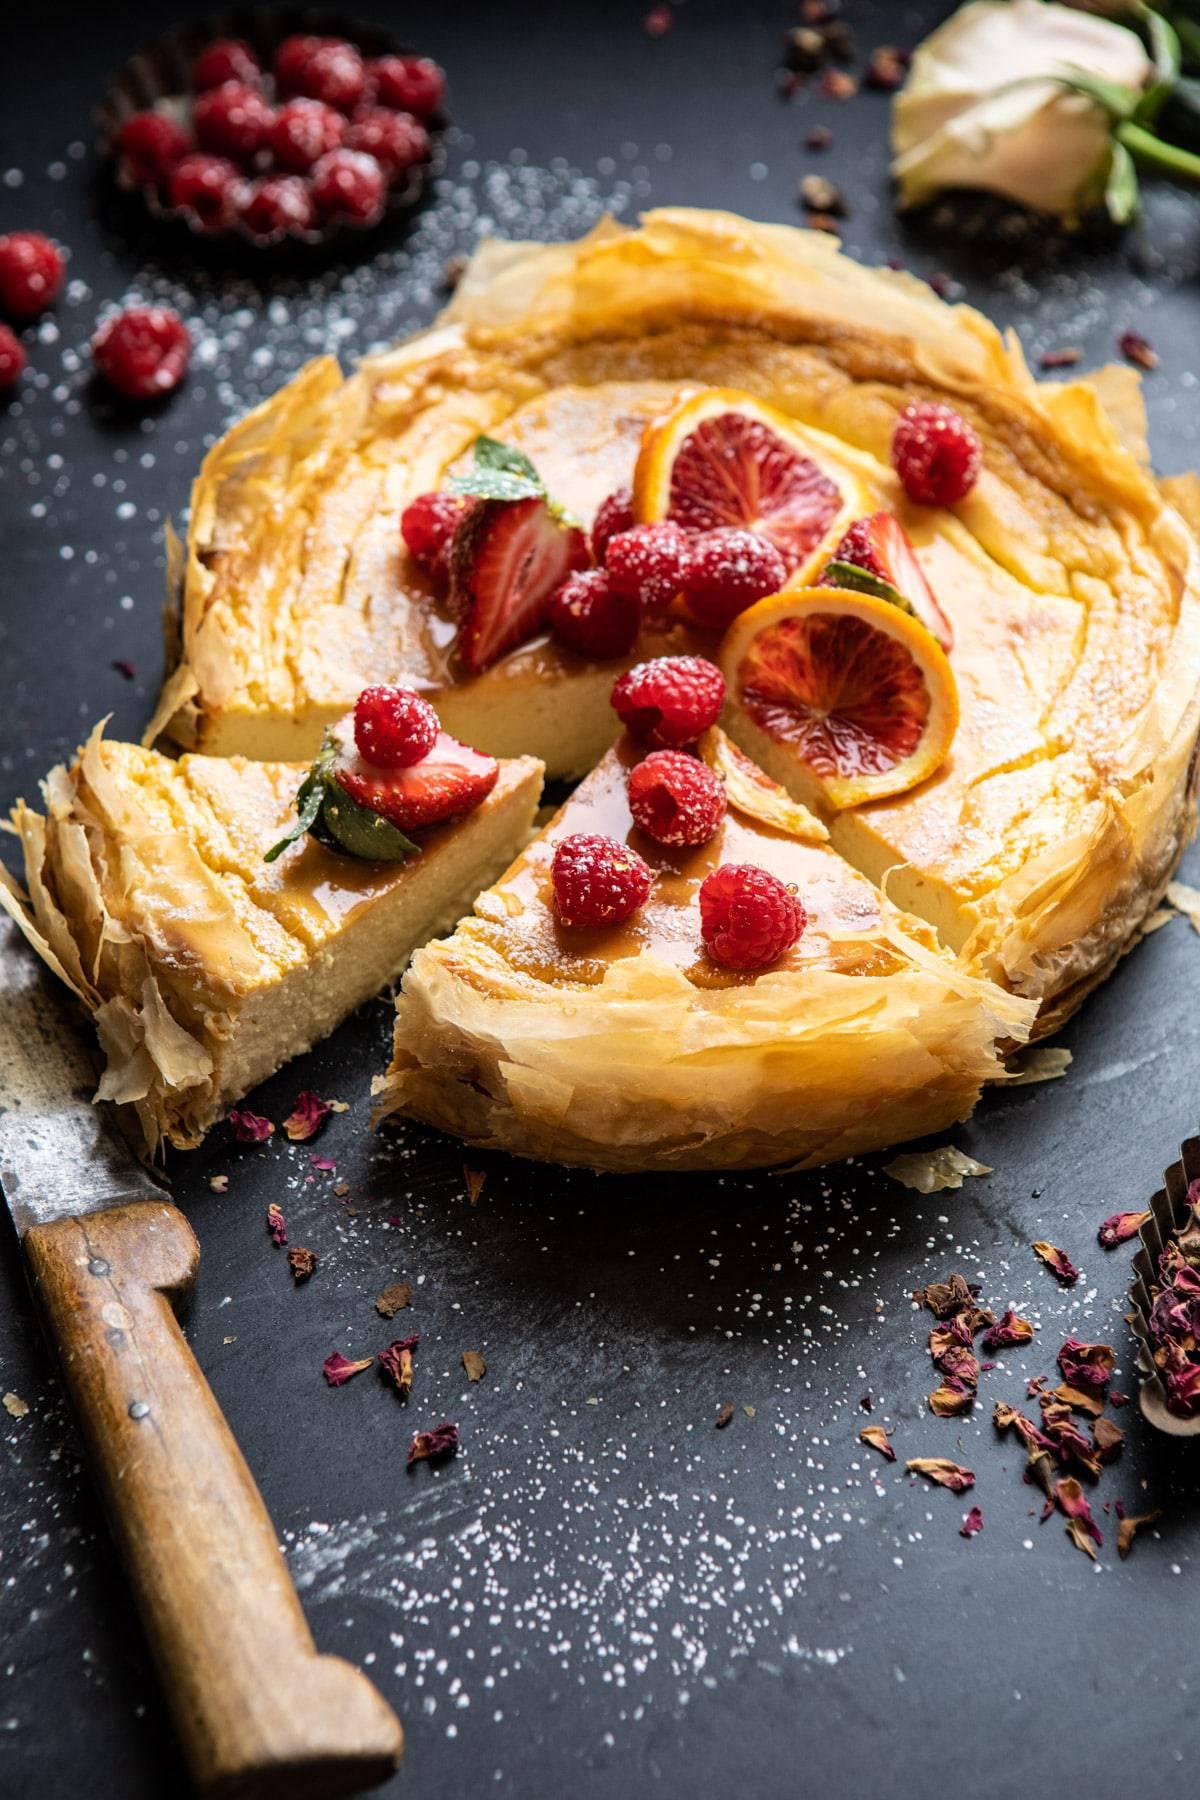 Whipped Lemon Ricotta Cheesecake | halfbakedharvest.com #cheesecake #easyrecipe #ricotta #deesert #cake #valentinesday